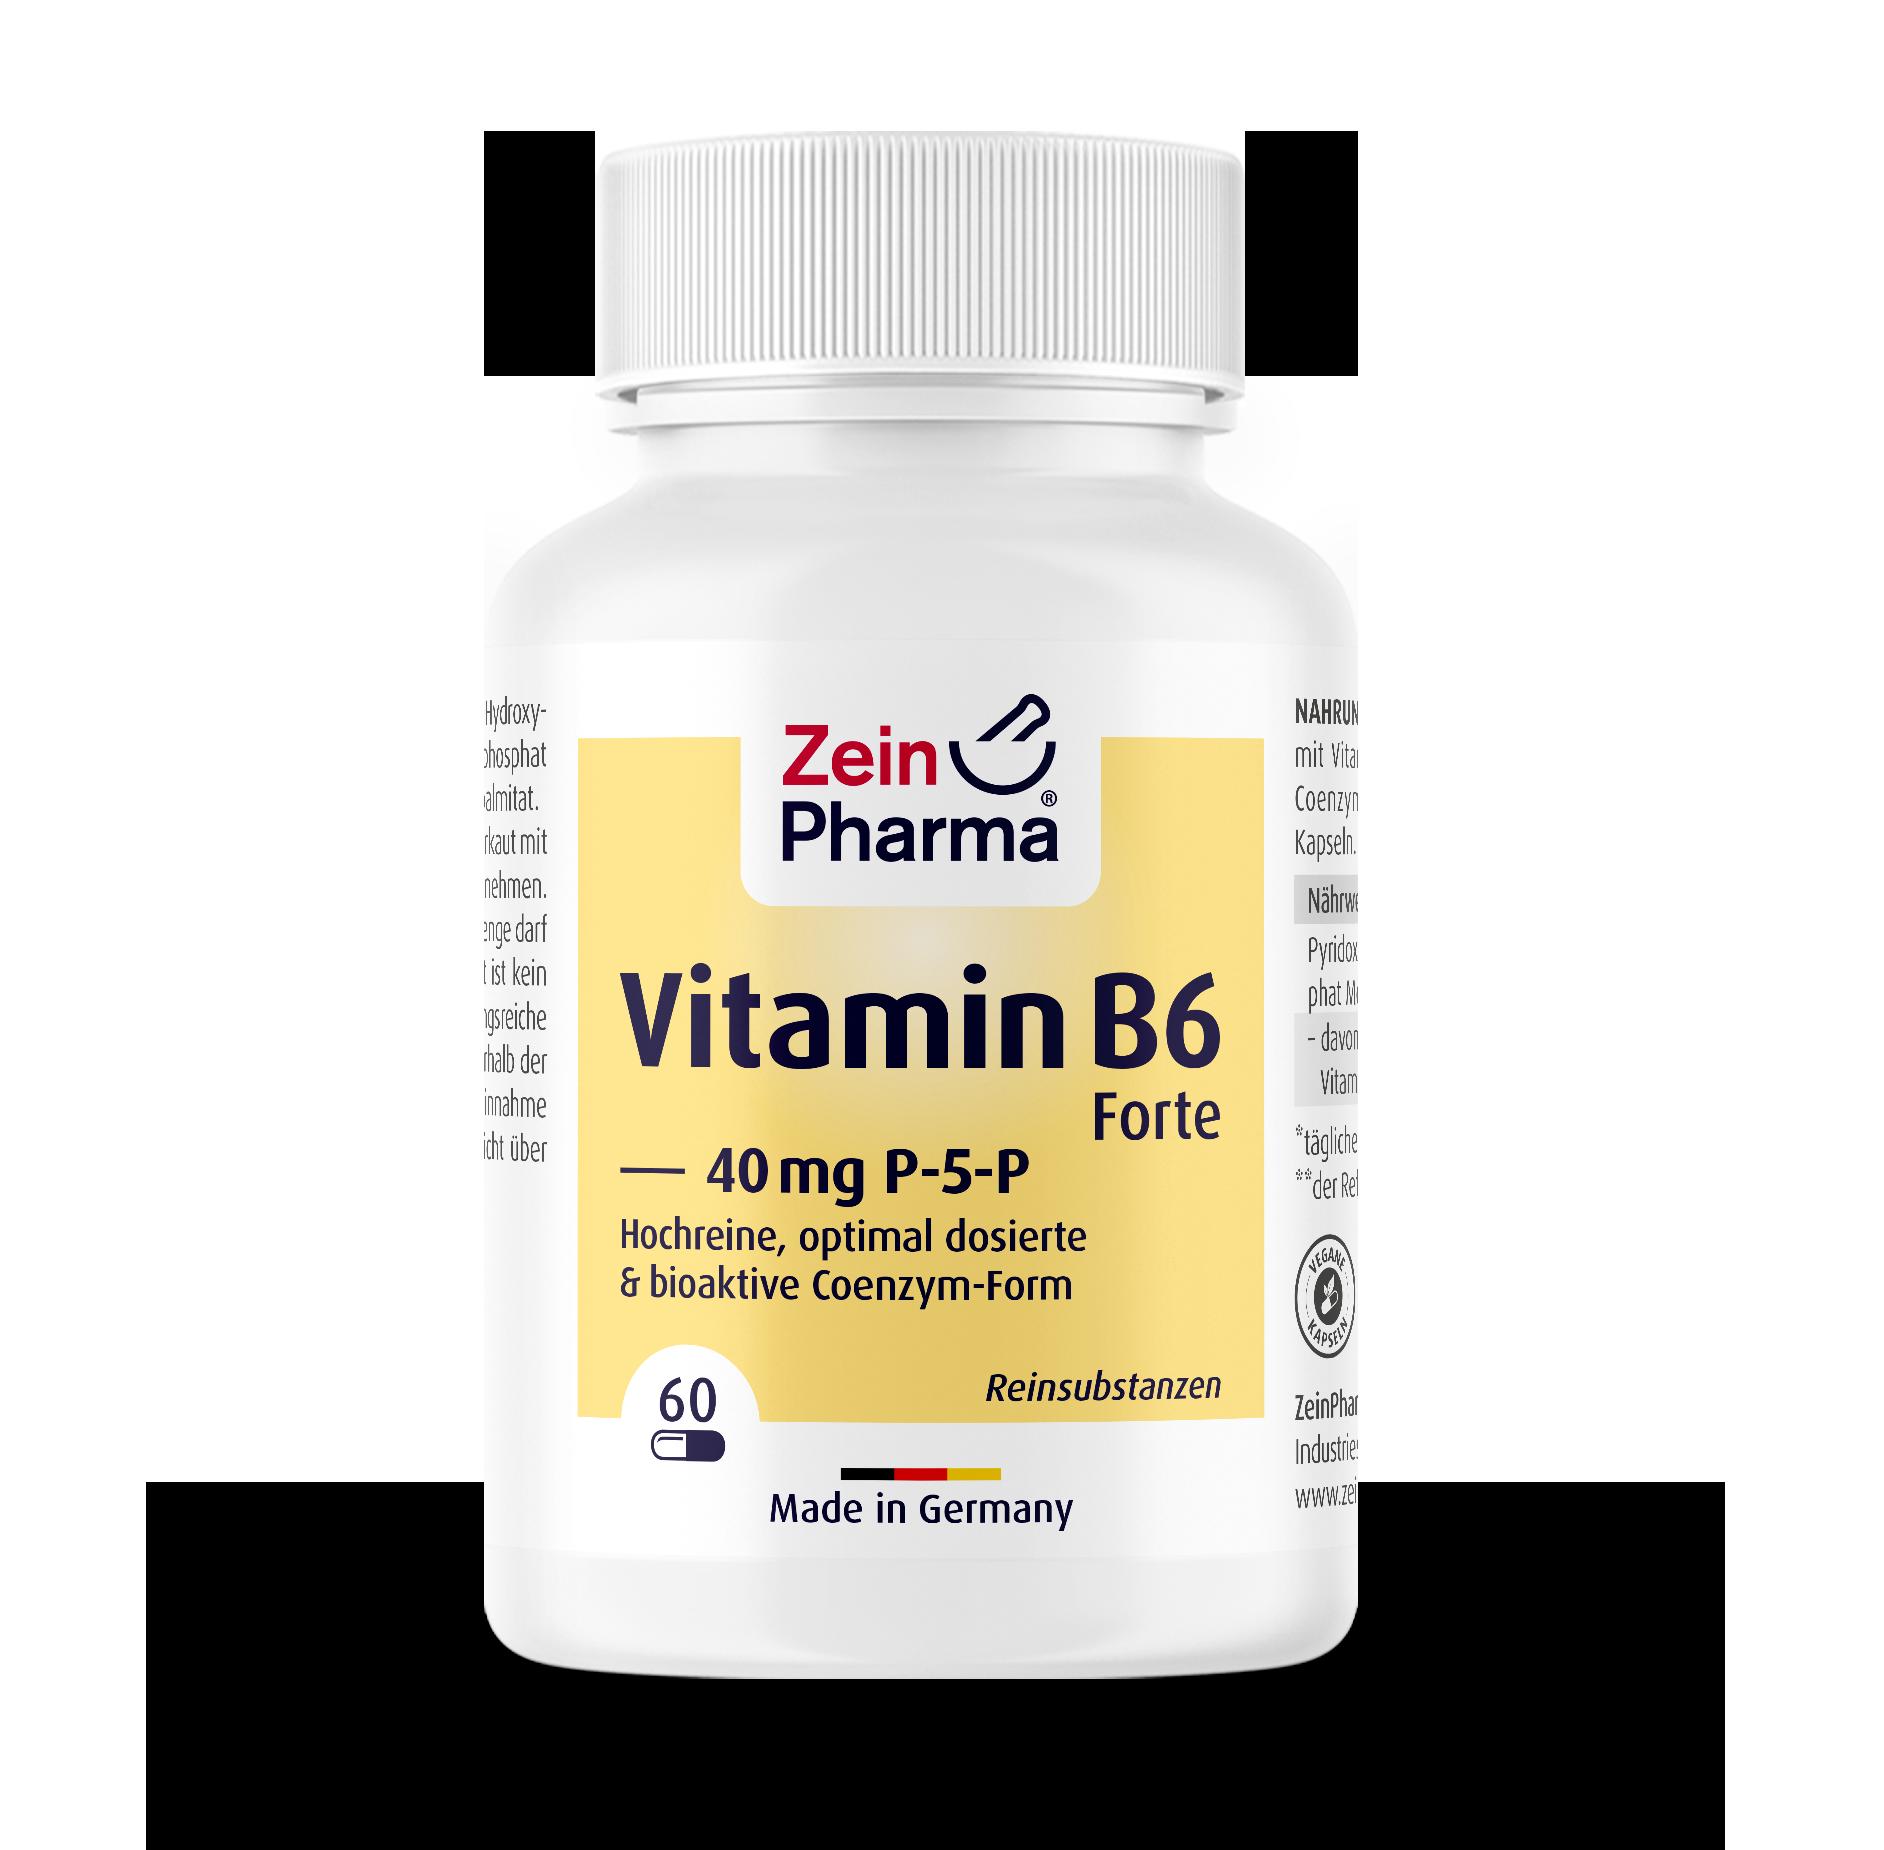 Vitamin B6 Forte (P-5-P) 40 mg Capsules